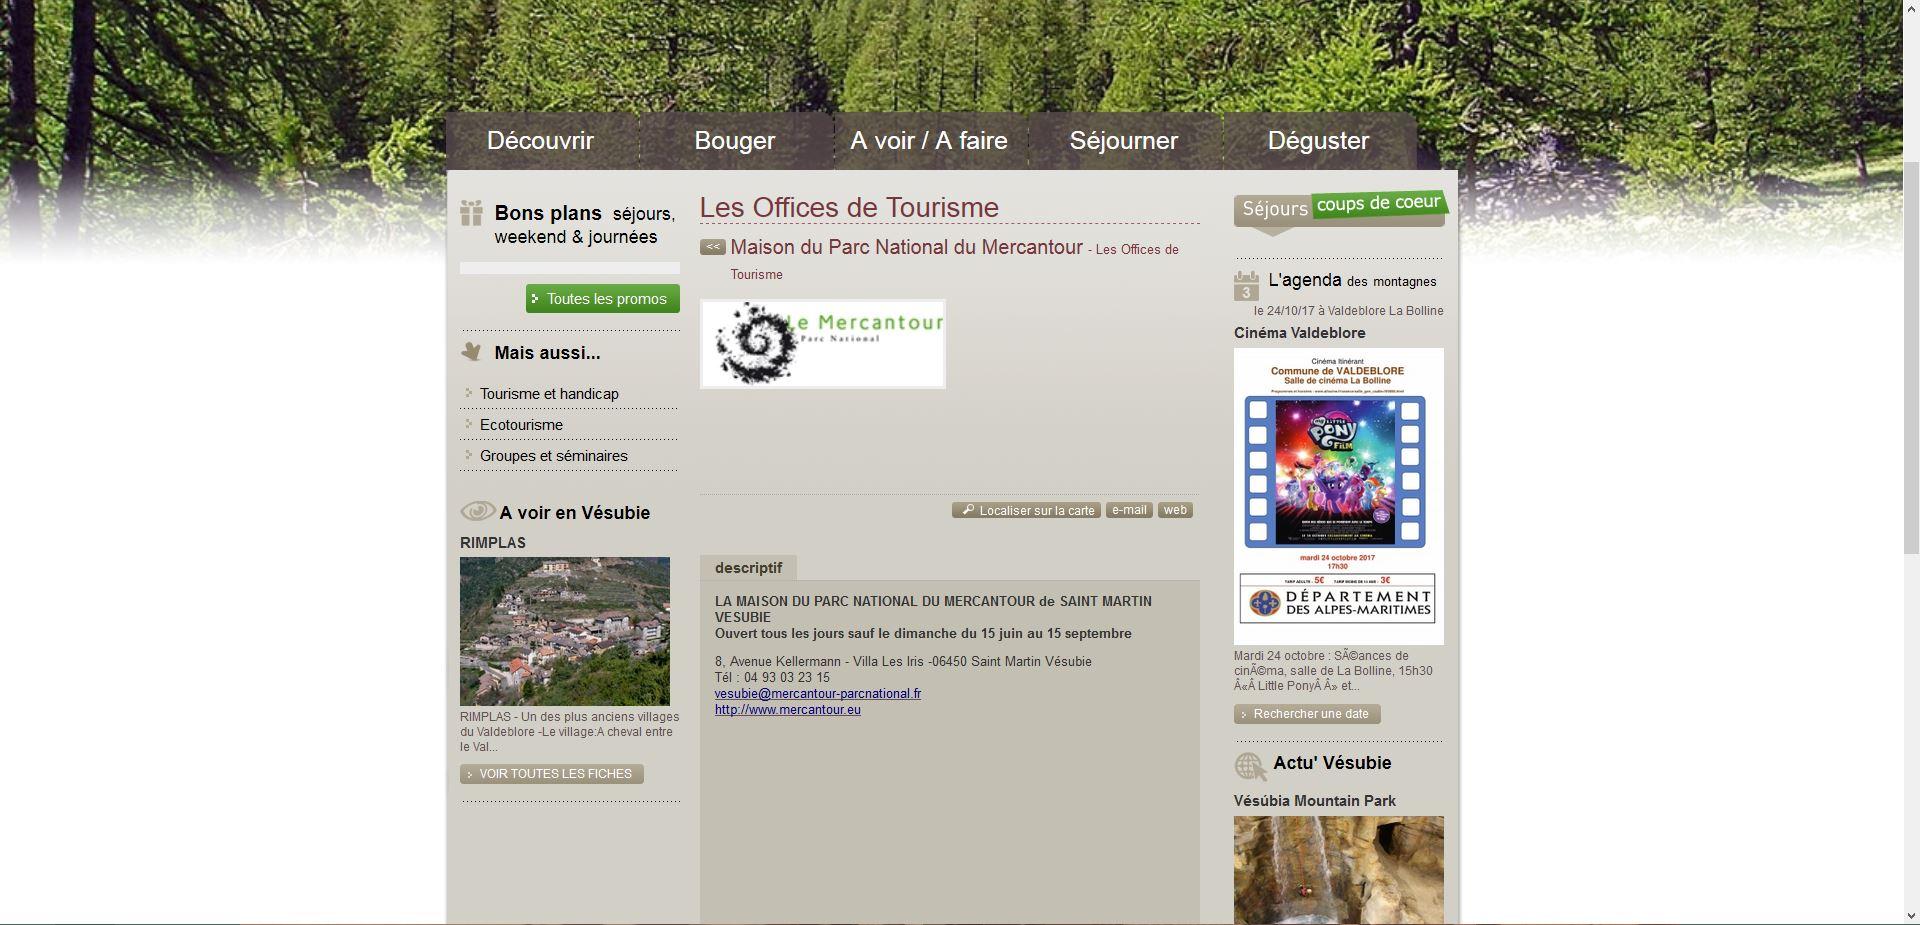 Maginot - La Route des Grandes Alpes - Page 20 Tsge_277